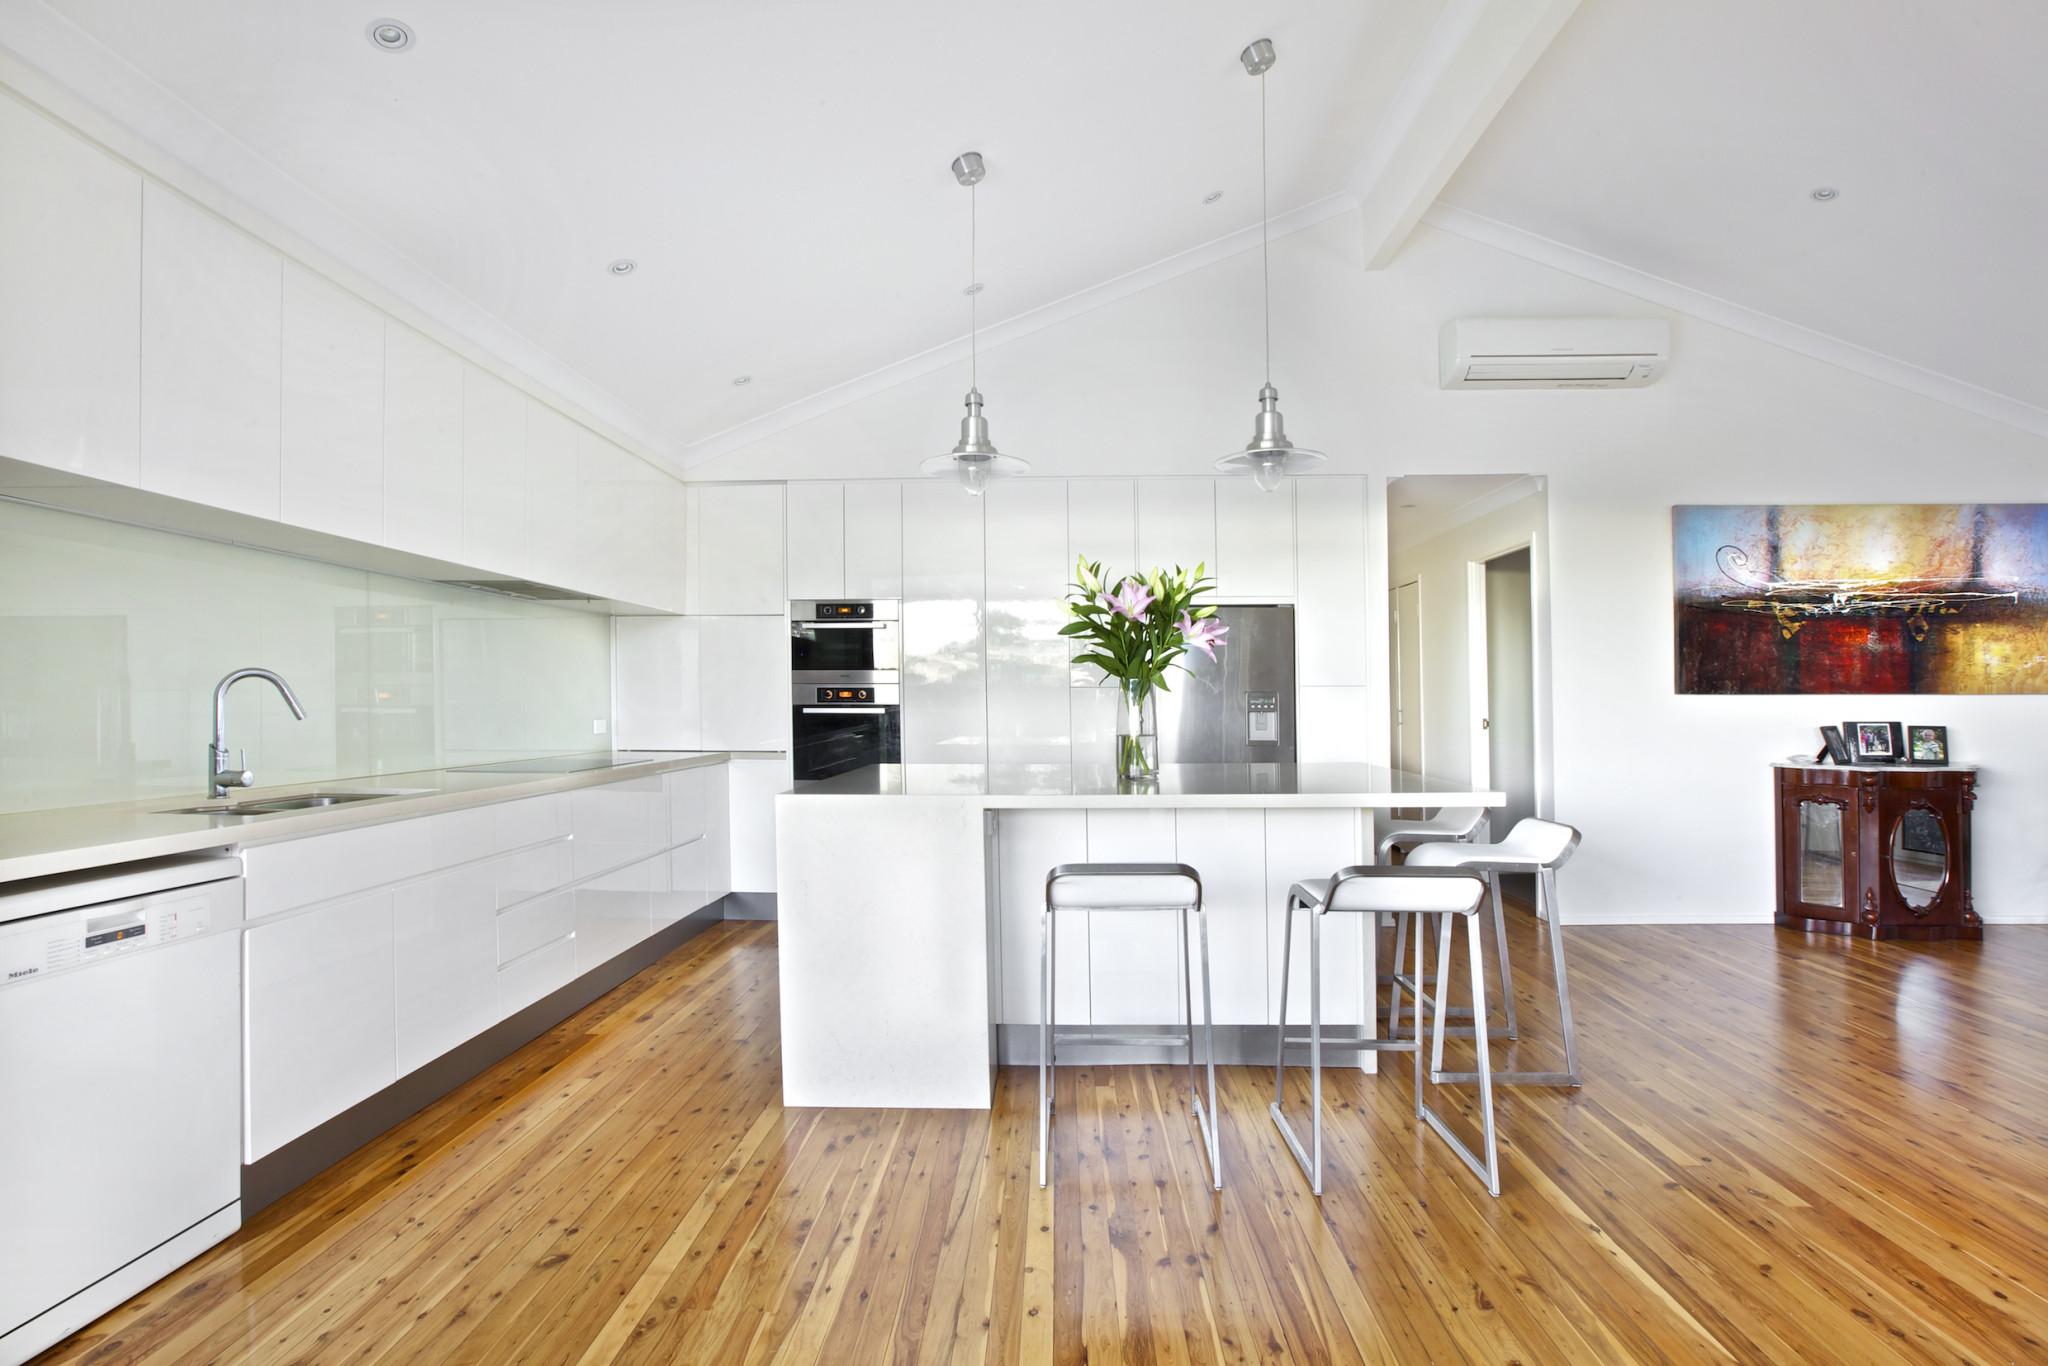 2014 Master Builders Award Winner – Renovations-Remodeling up to ...